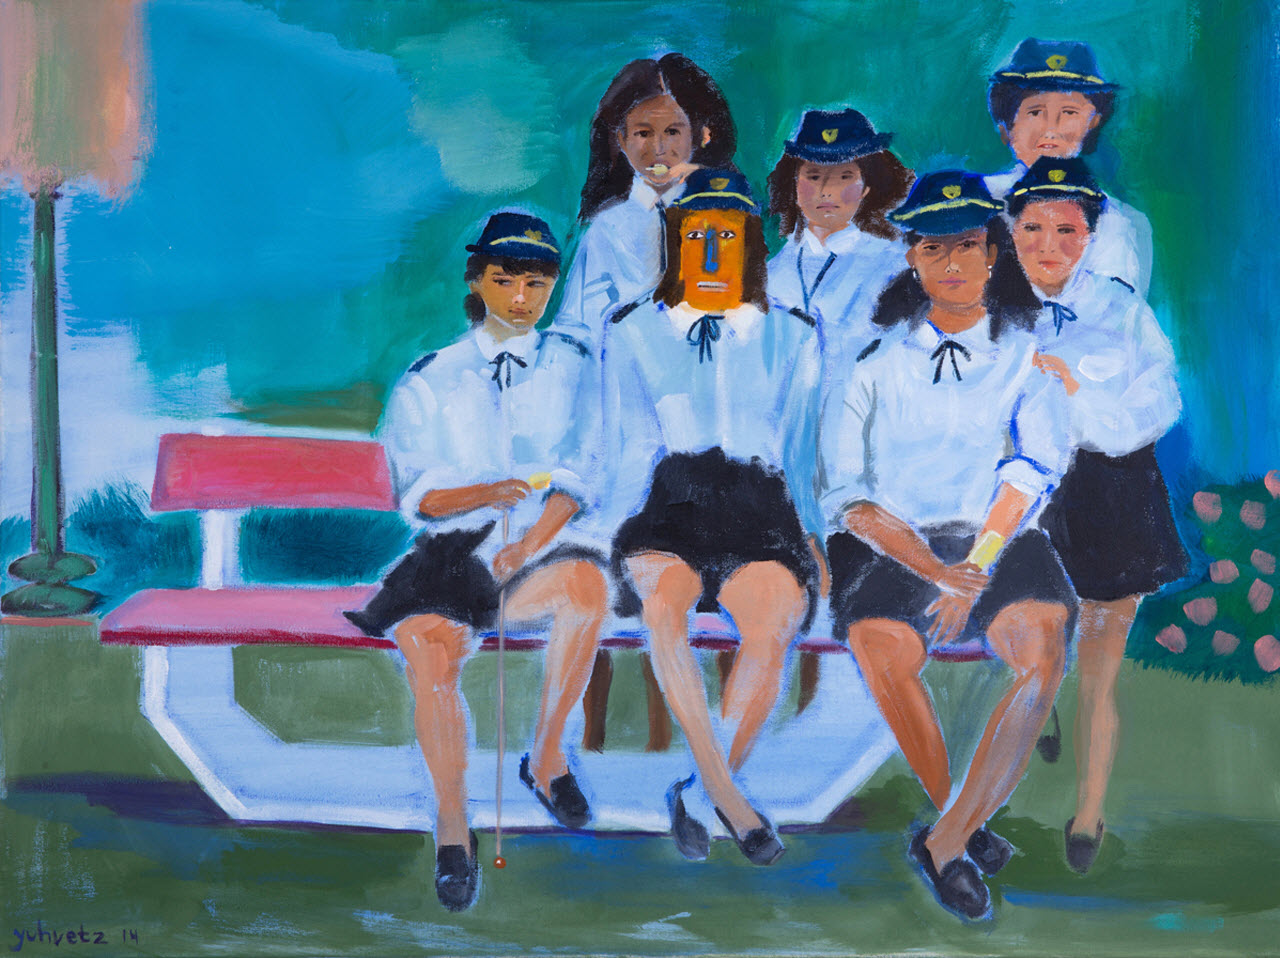 Play Together | Acrylic on canvas / 80x60cm / 2014